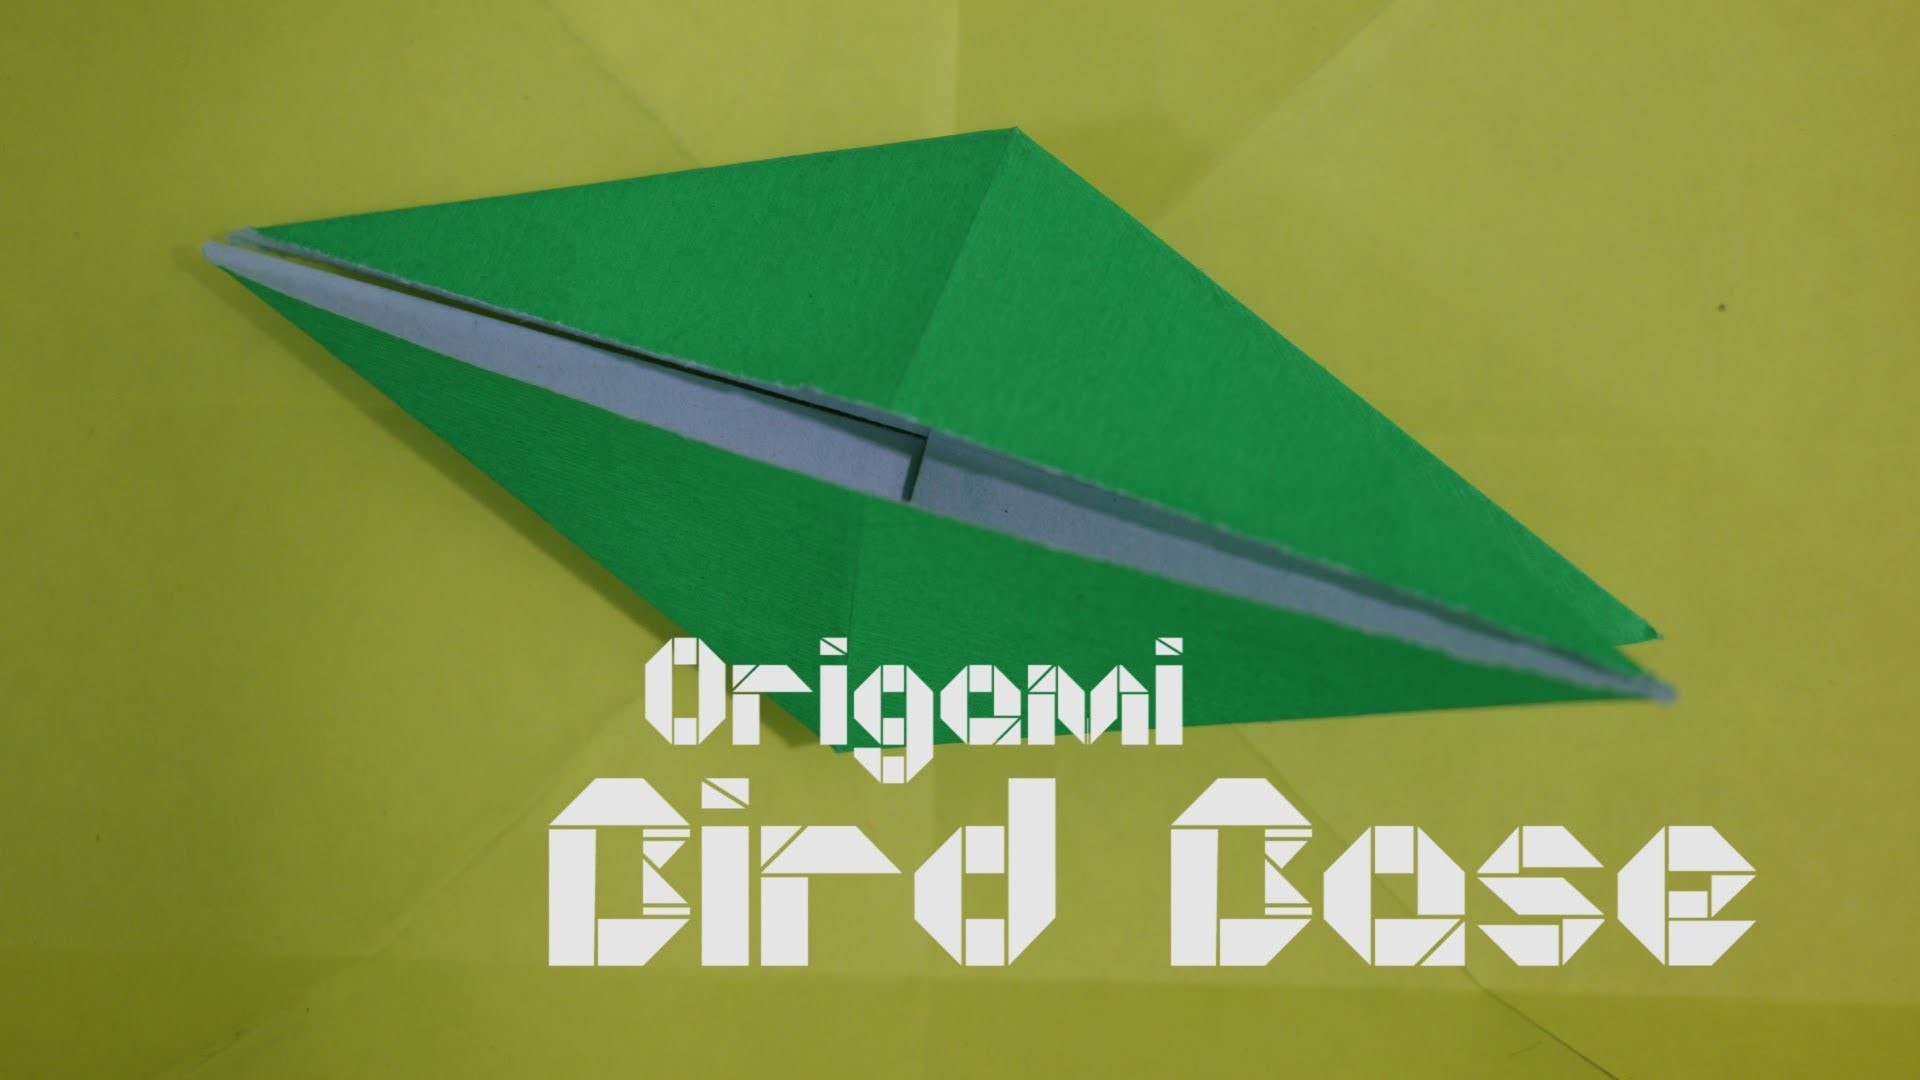 How to make Origami Birdbase - By Origami Artists